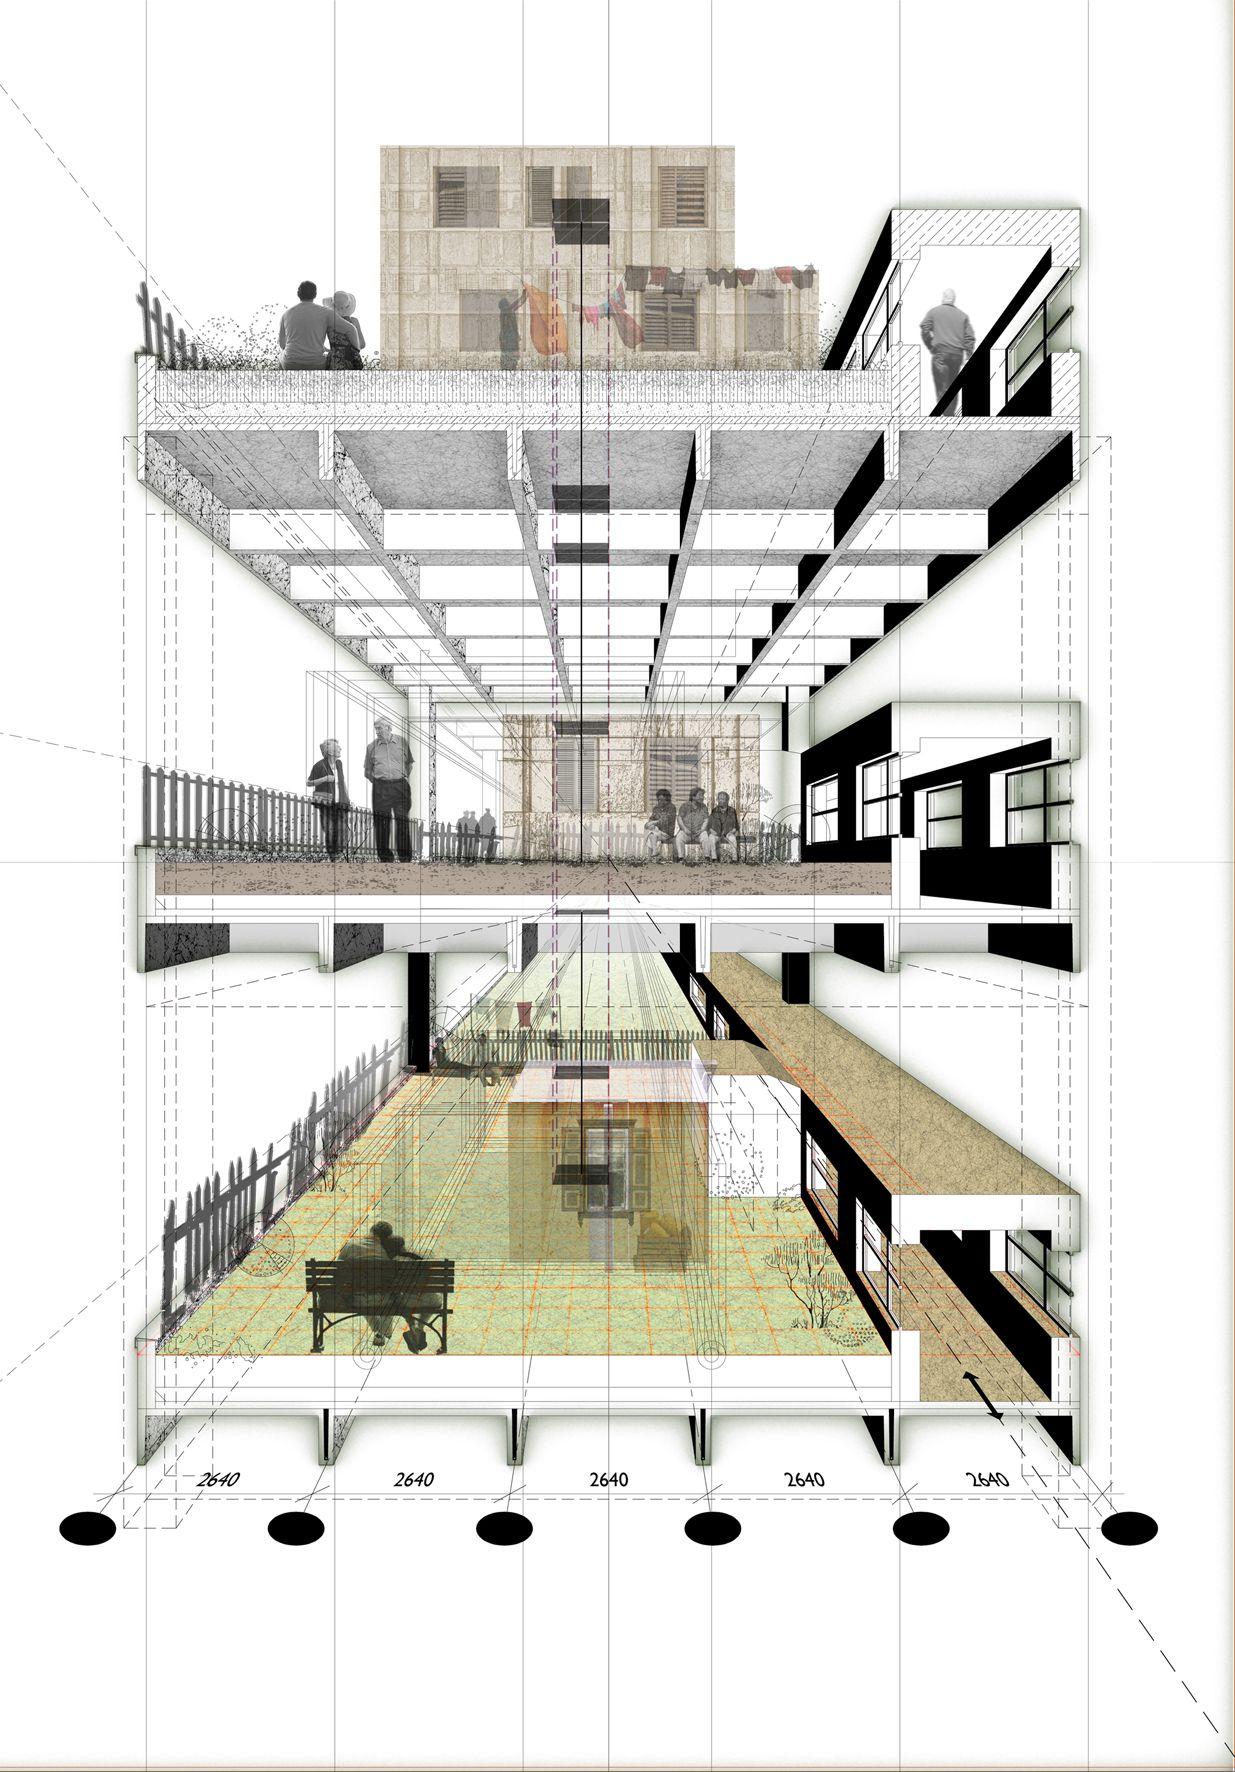 Secciones fugadas representaci n arquitect nica for Representacion arquitectonica en planos